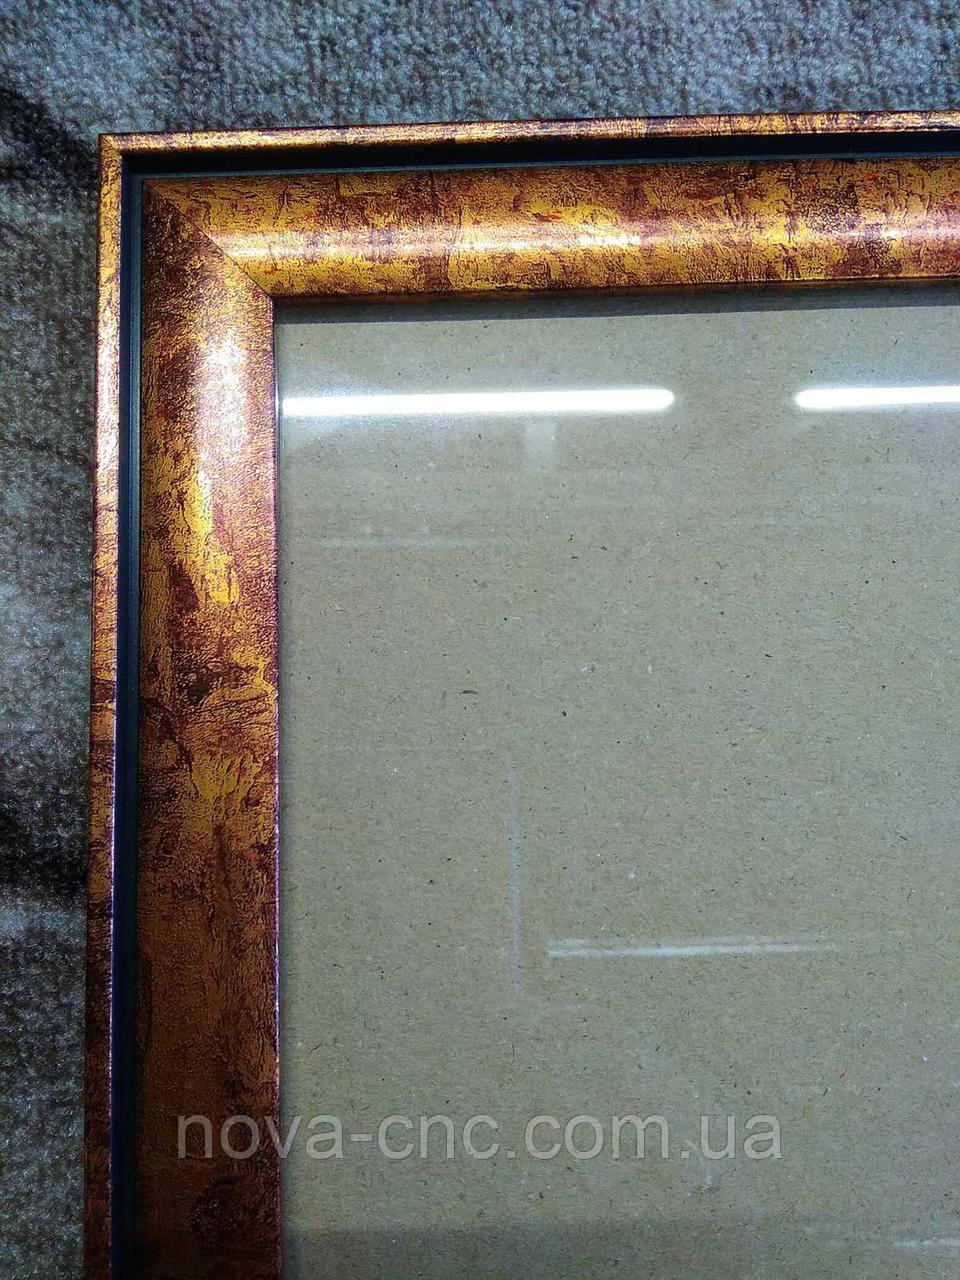 Рамка бронза мрамор 40 х 60 см